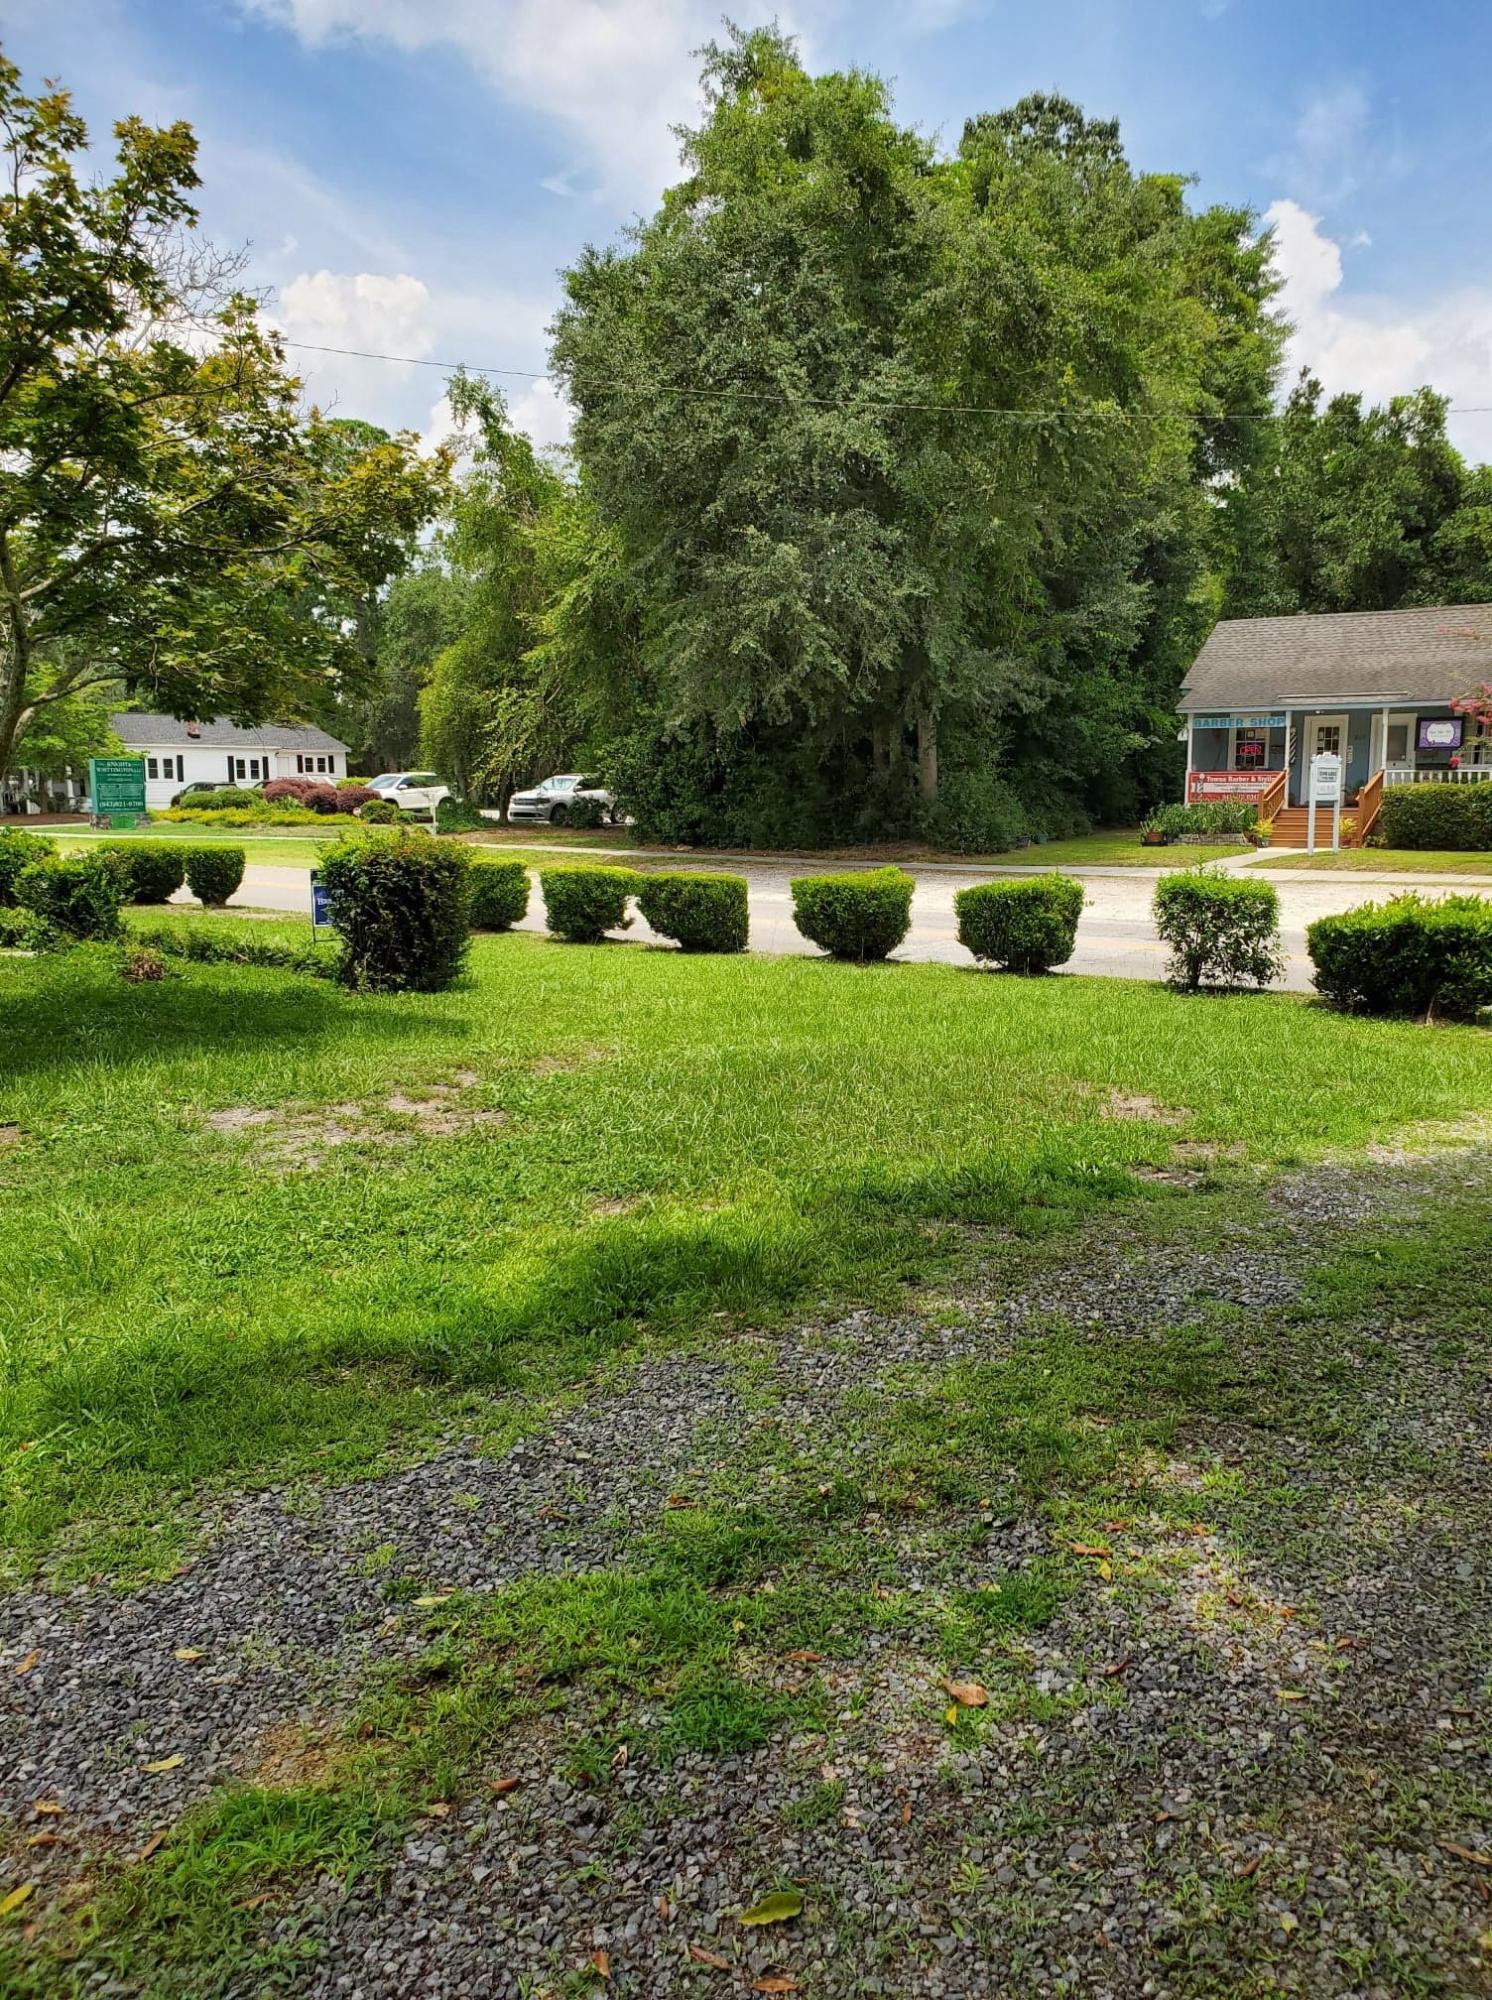 Summerville Homes For Sale - 208 3rd North, Summerville, SC - 2